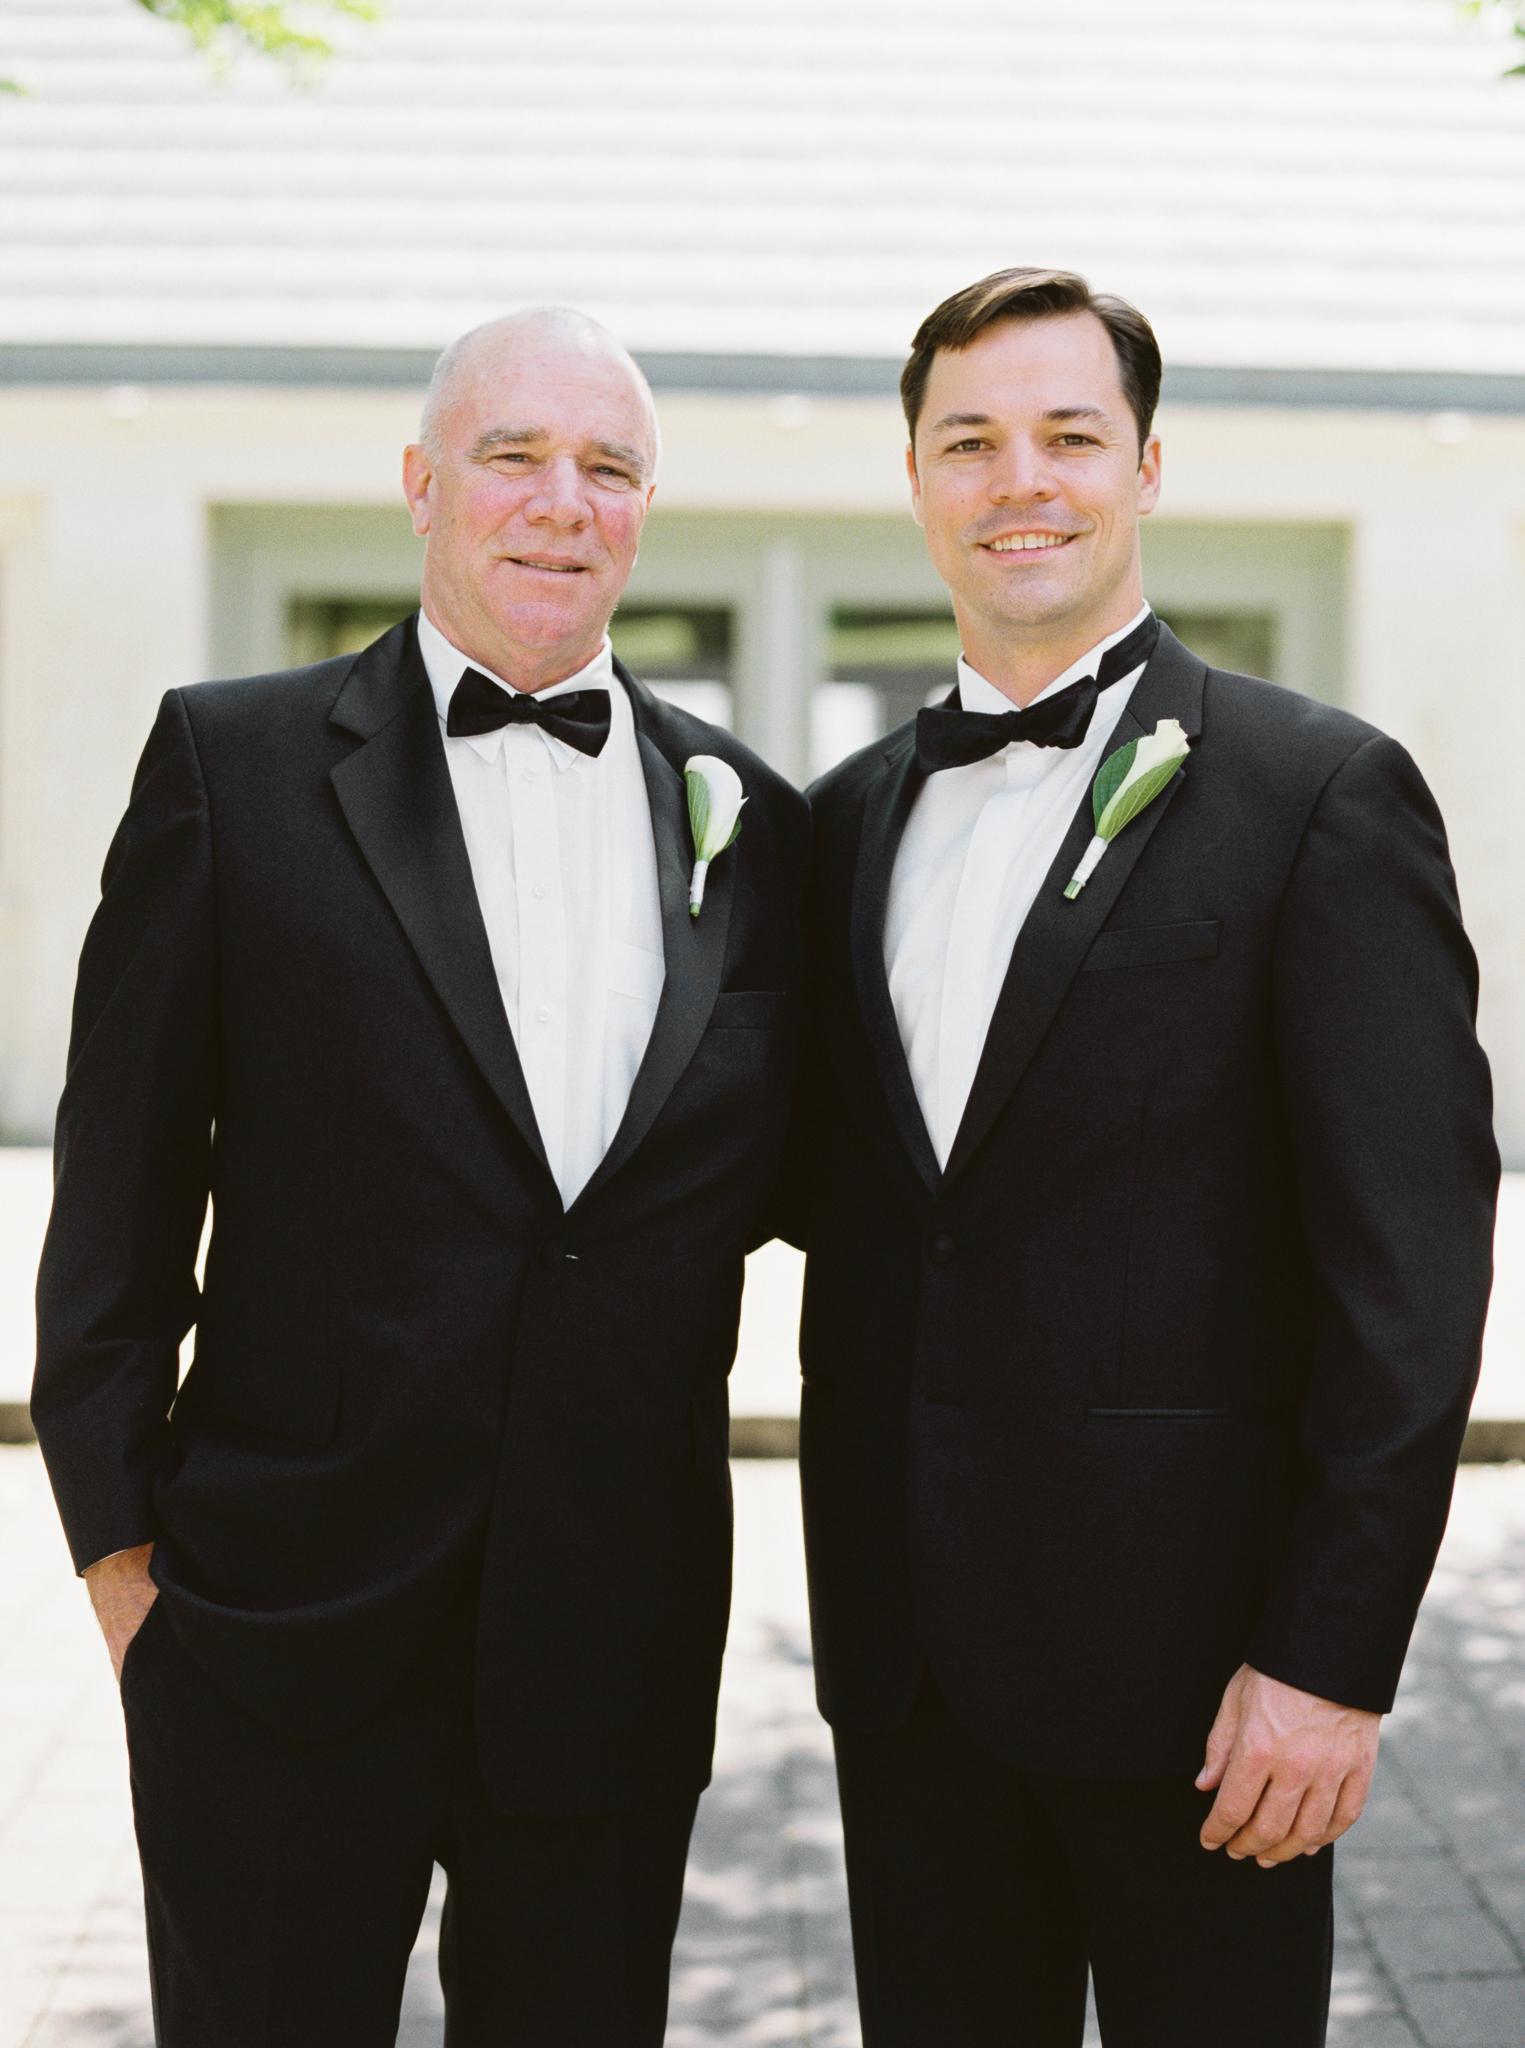 073OutliveCreative_Travel_Photographer_Videographer_Lewis&Clark_Oregon_Elegant_BlackTie_Destination_Wedding.jpg